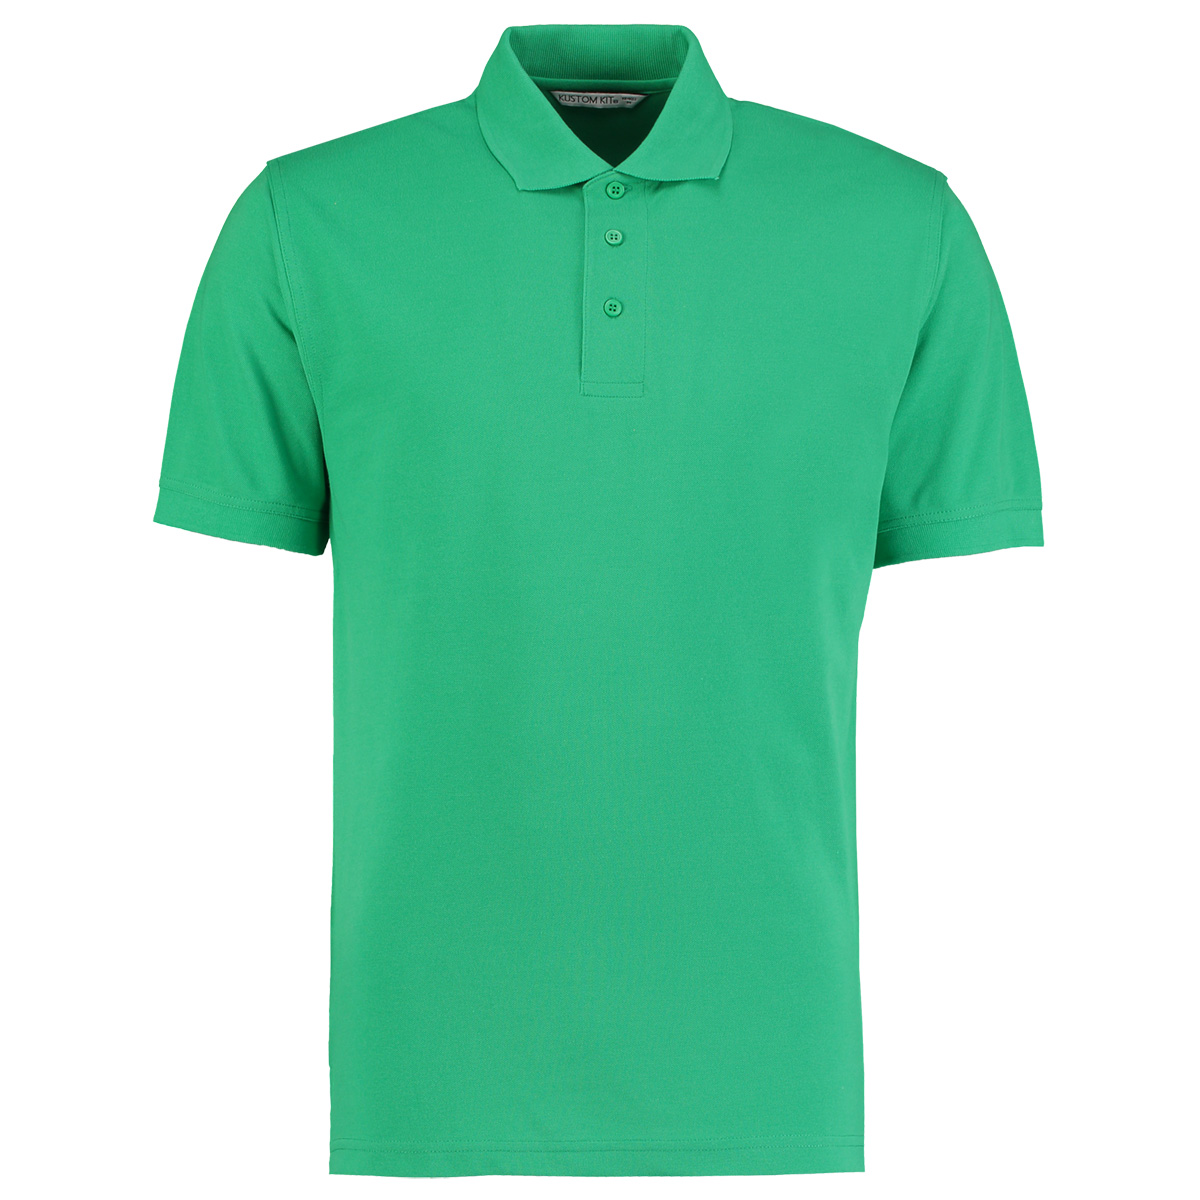 Light Green Collared Shirt Bcd Tofu House